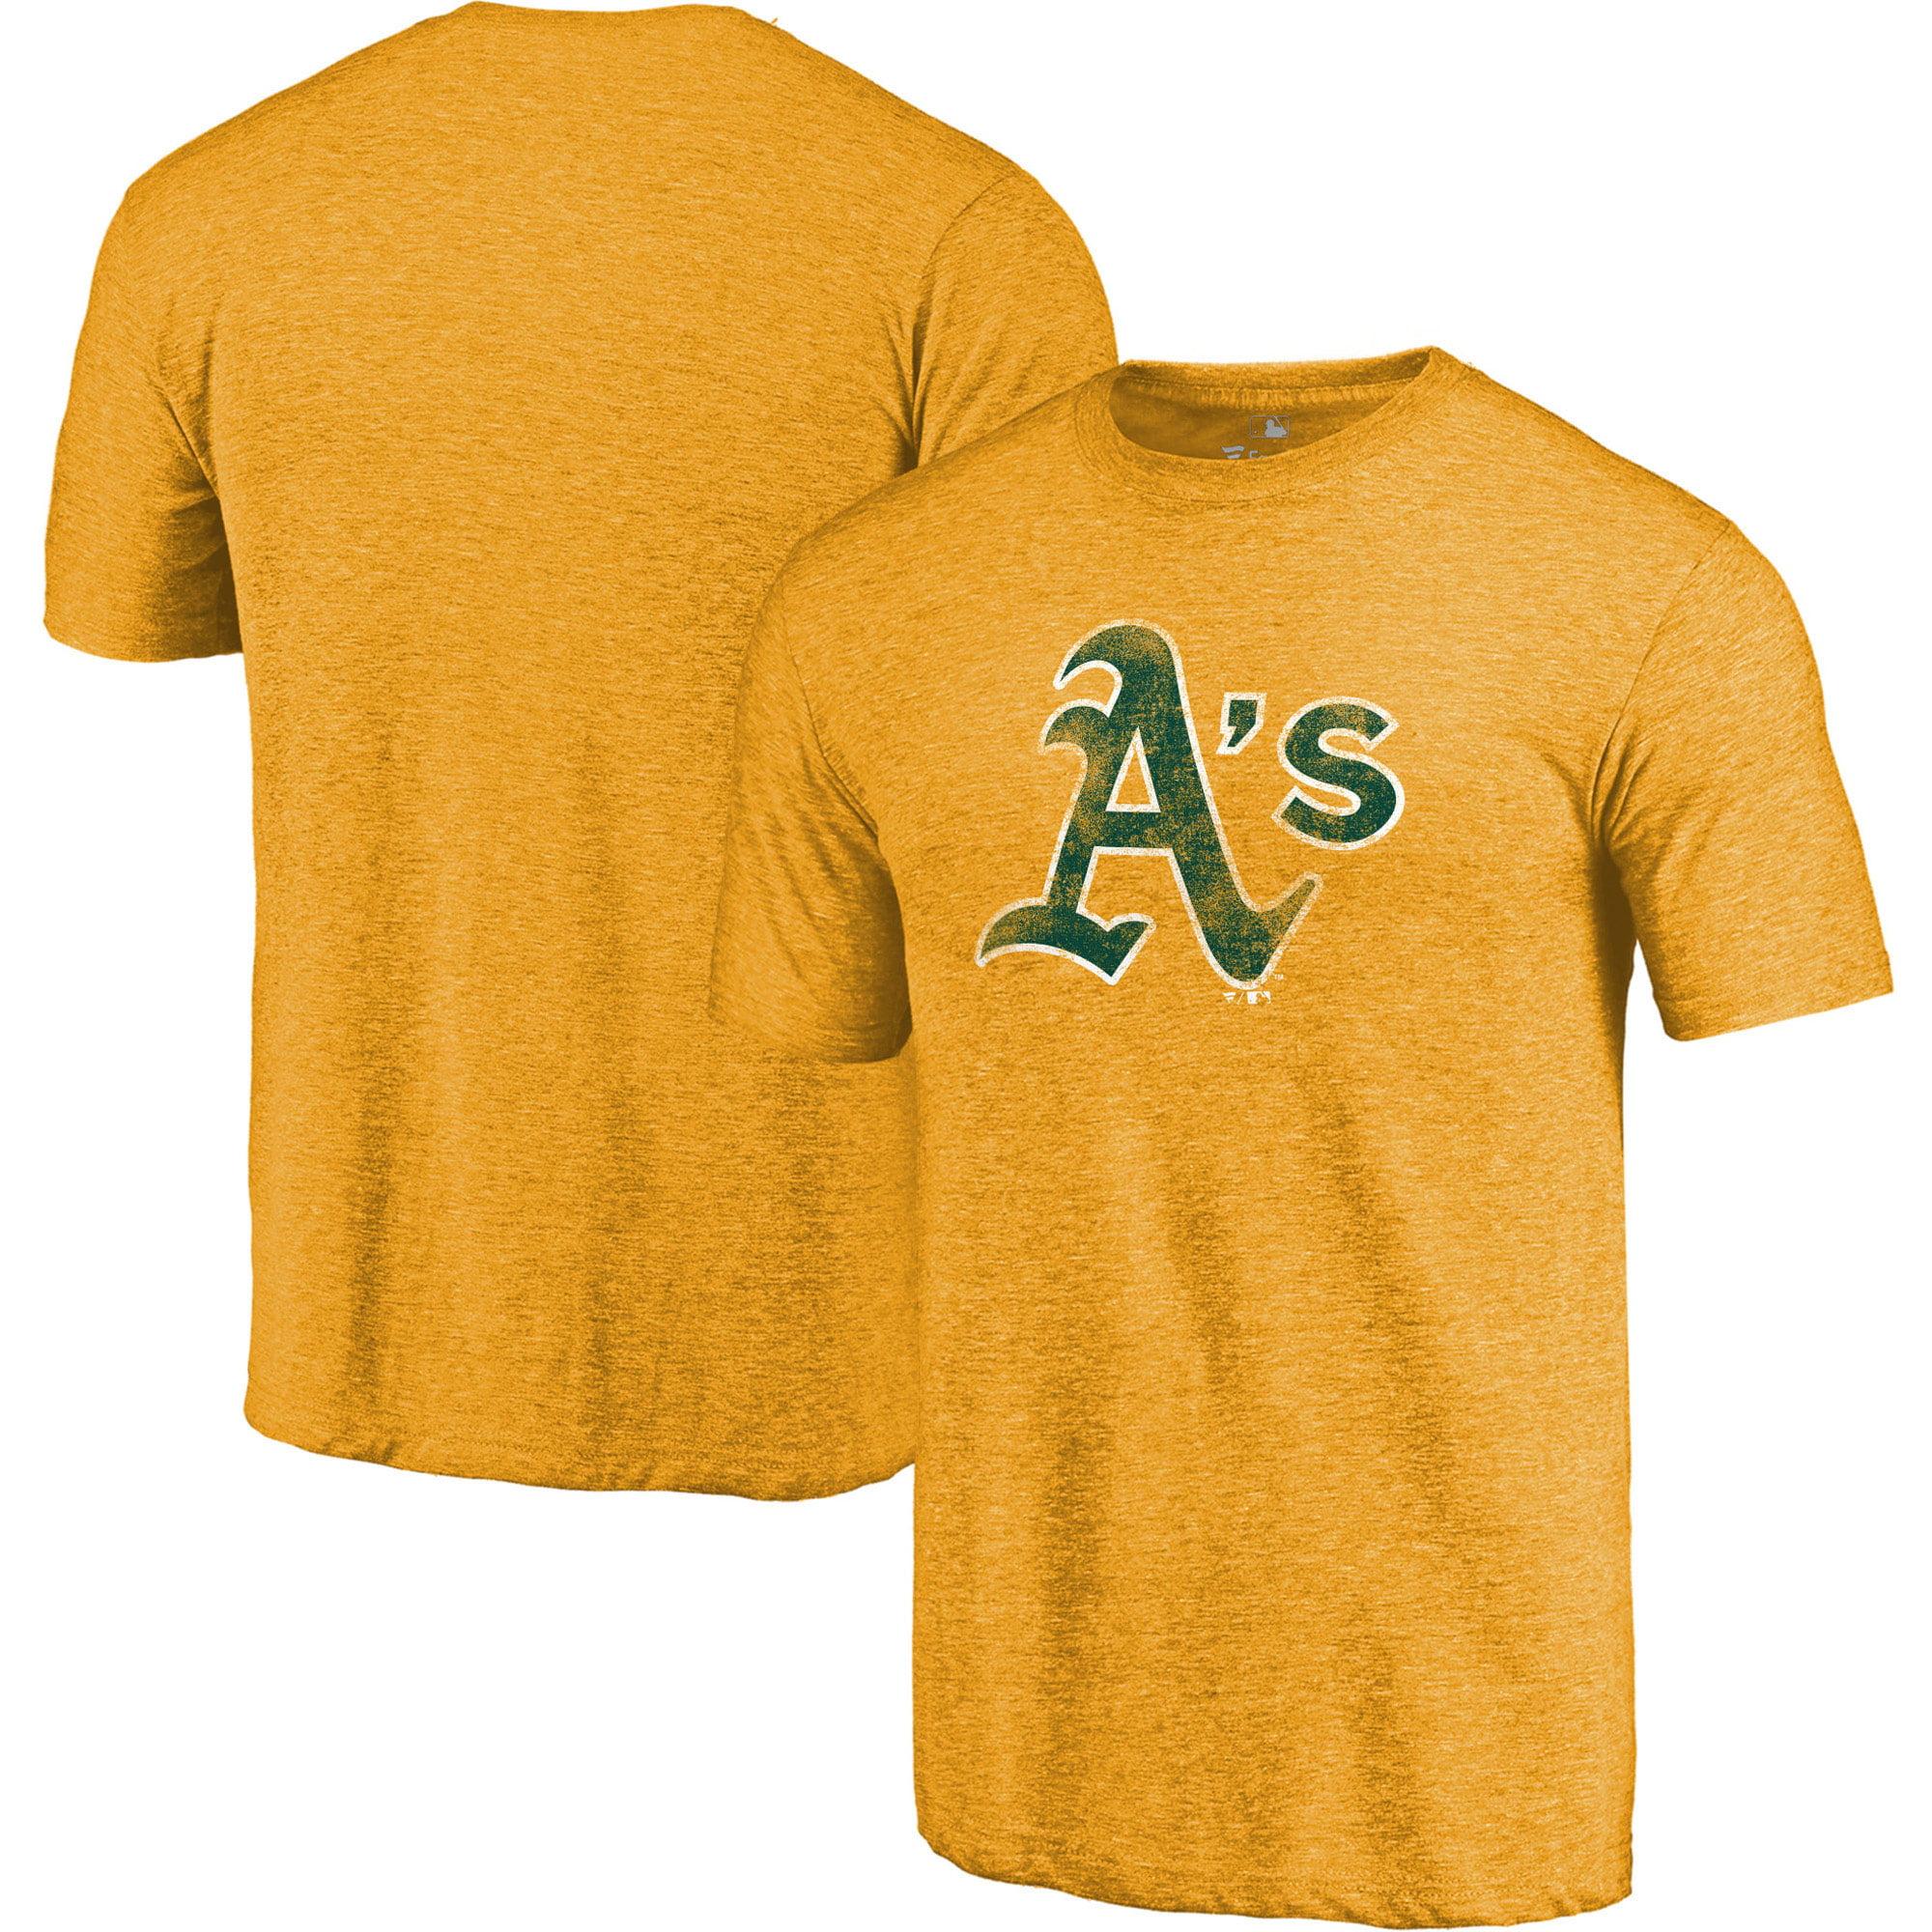 Oakland Athletics Fanatics Branded Team Distressed Tri-Blend T-Shirt - Gold